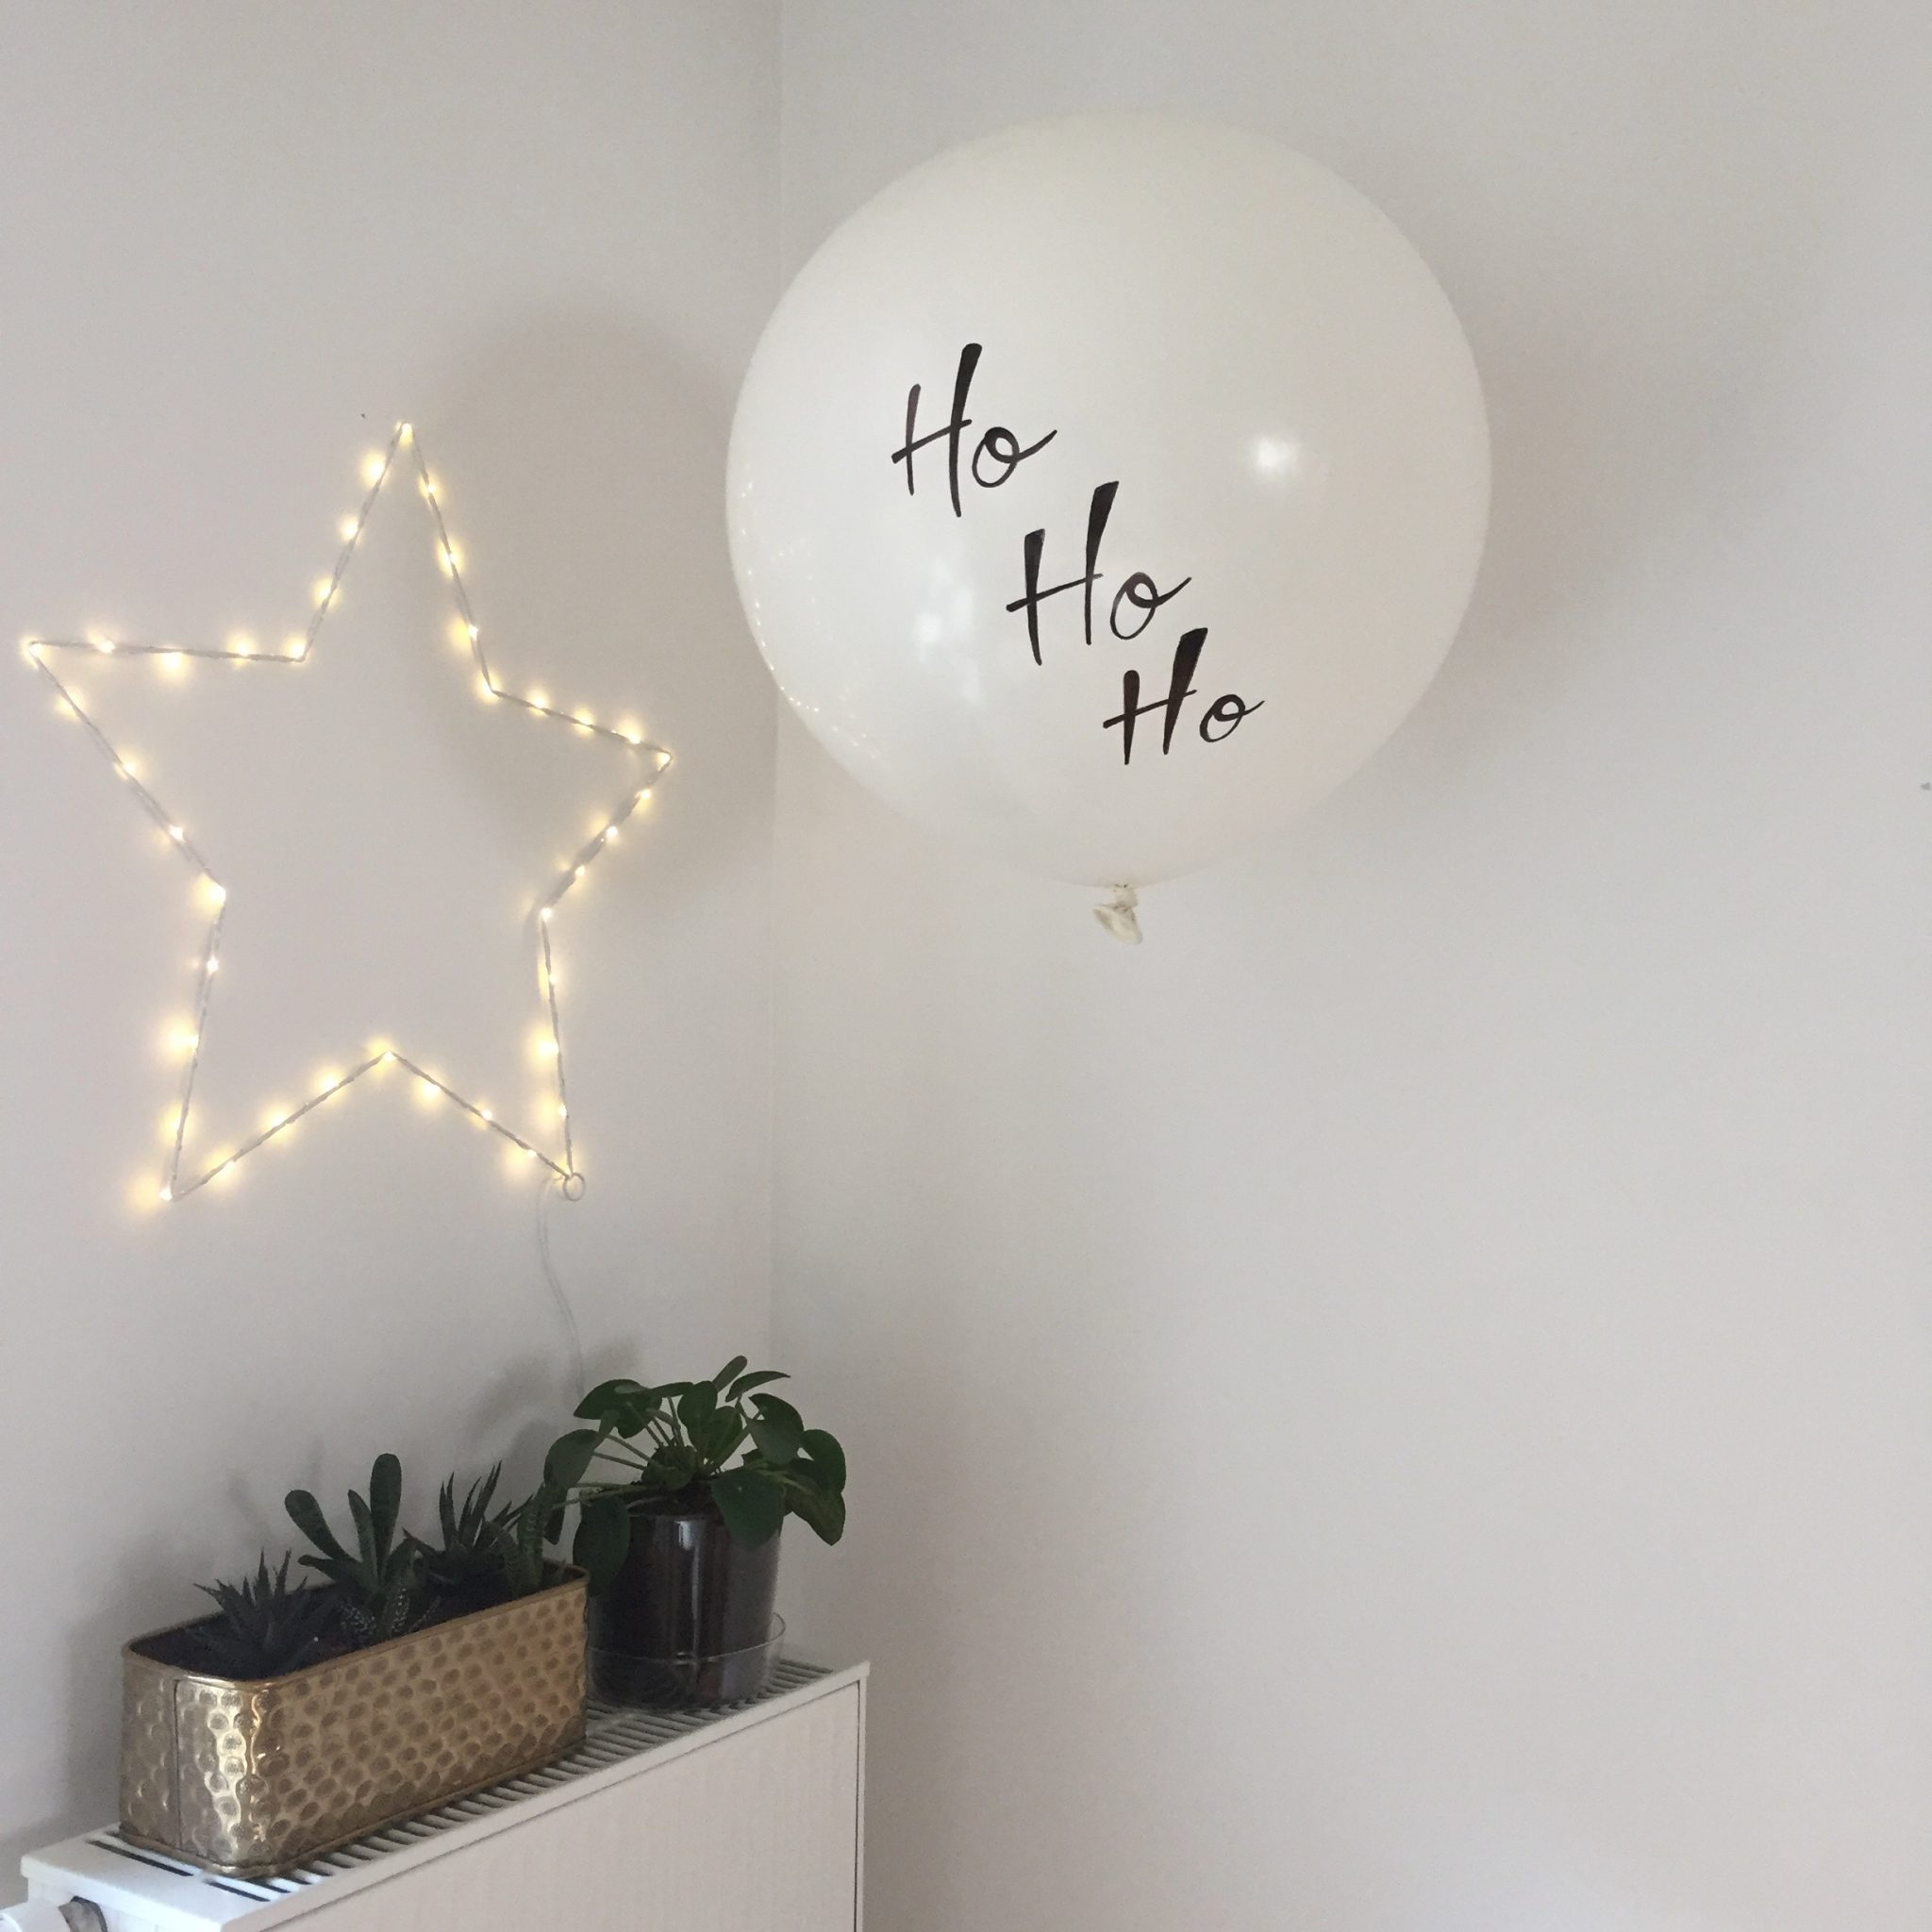 étoile lumineuse led 49 cm décoration Noel blanc